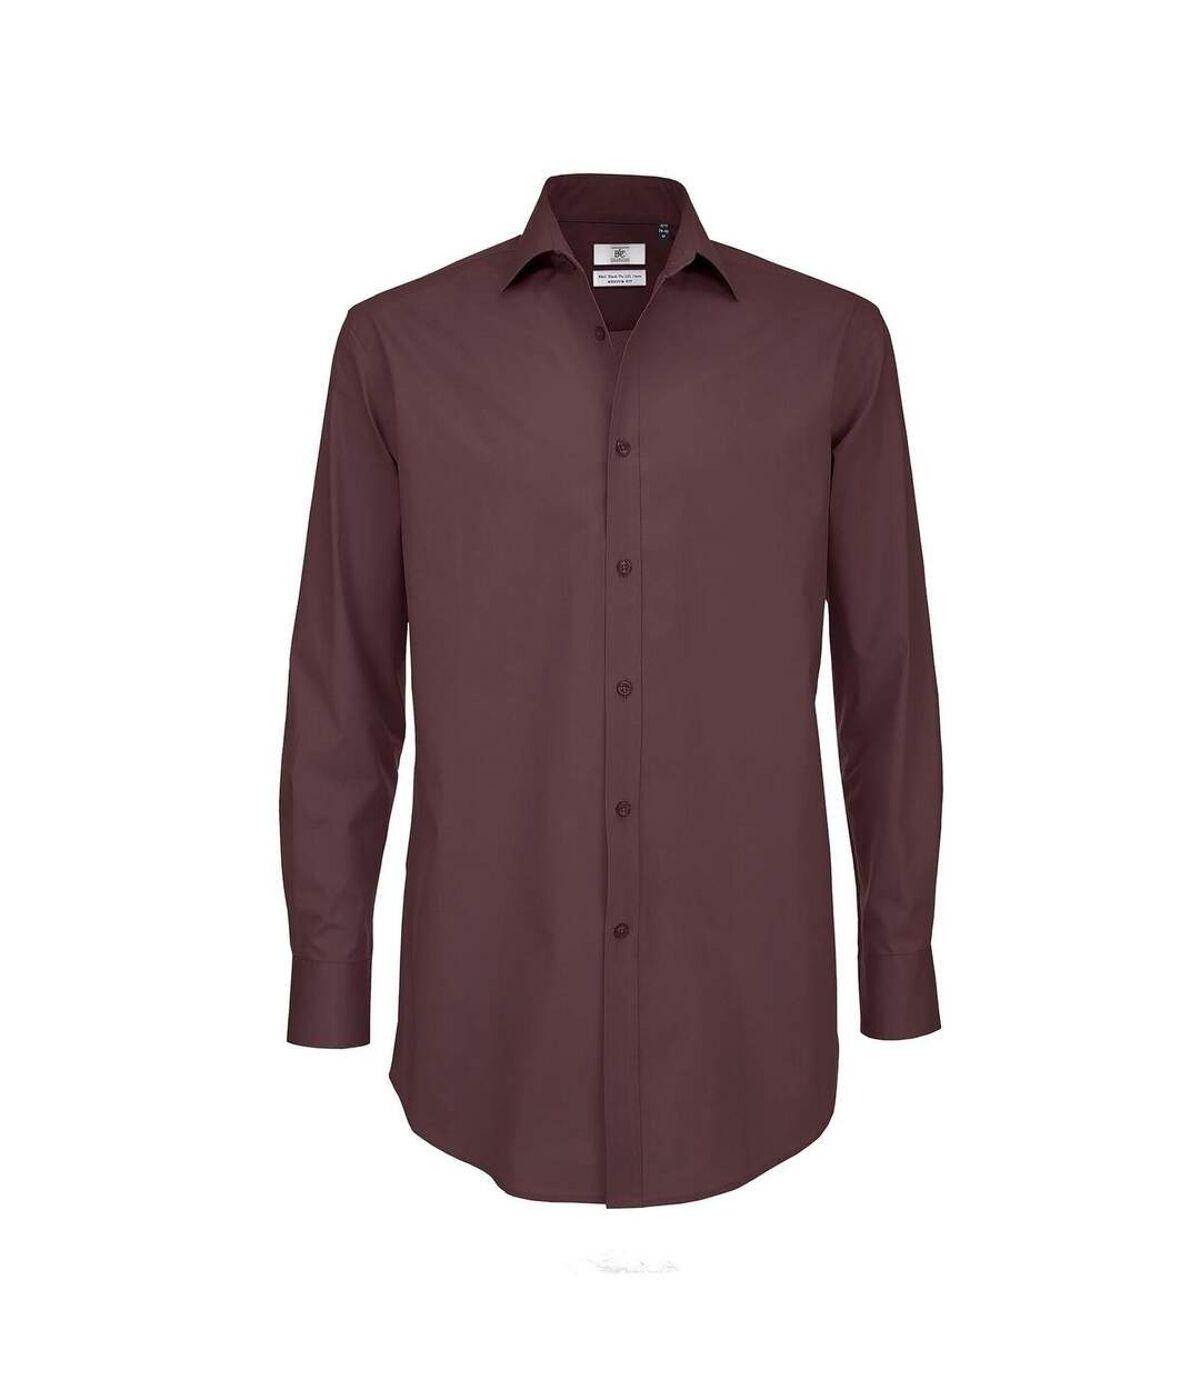 B&C Mens Black Tie Long Sleeve Formal Work Shirt (Luxurious Red) - UTRW3521